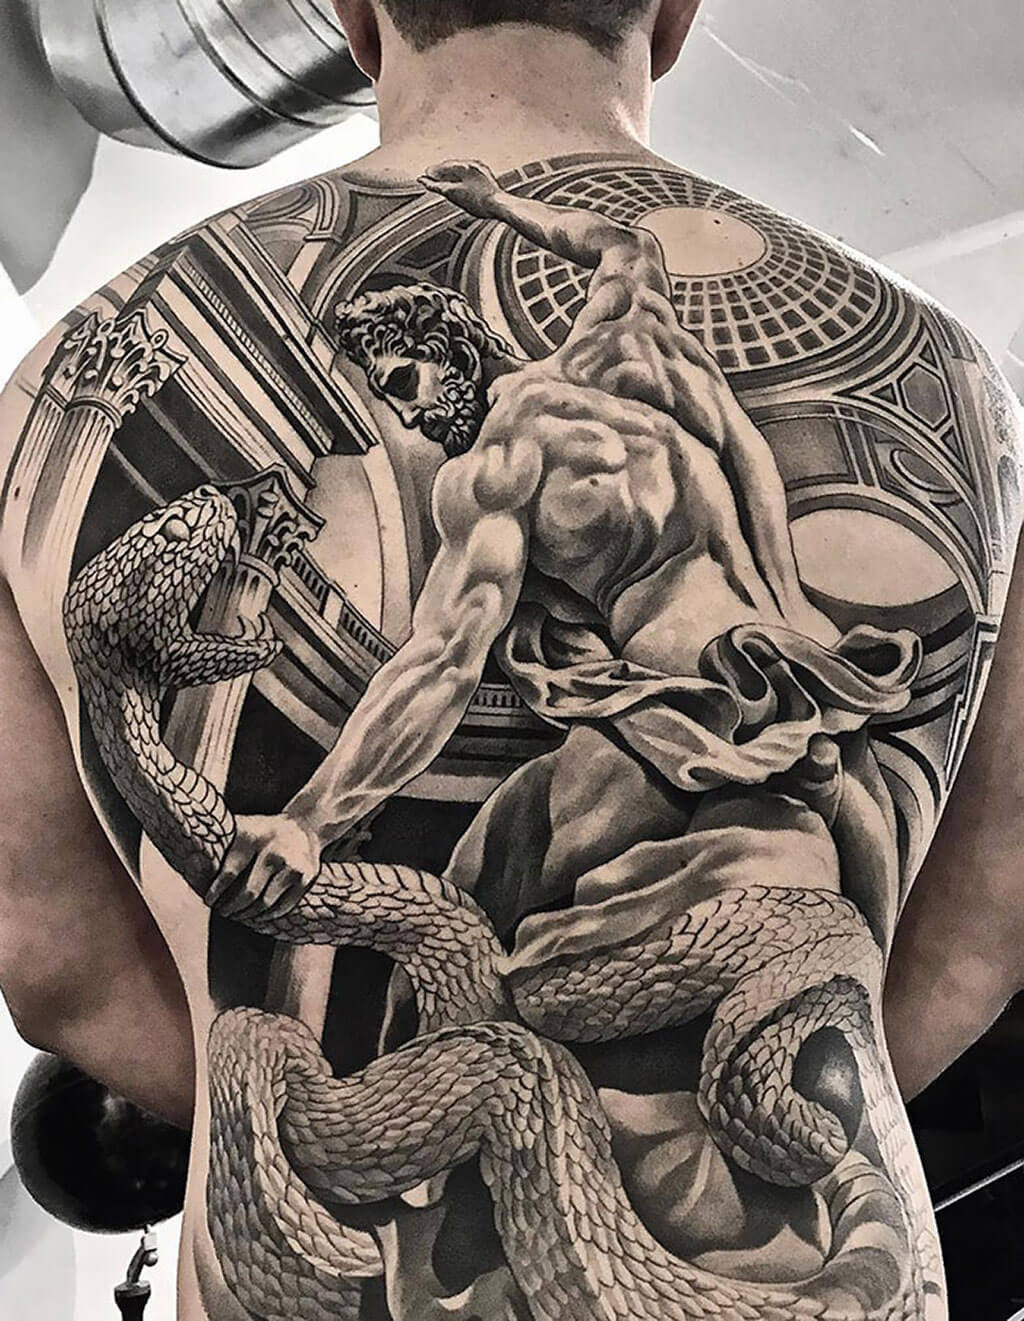 Impressive back tattoos